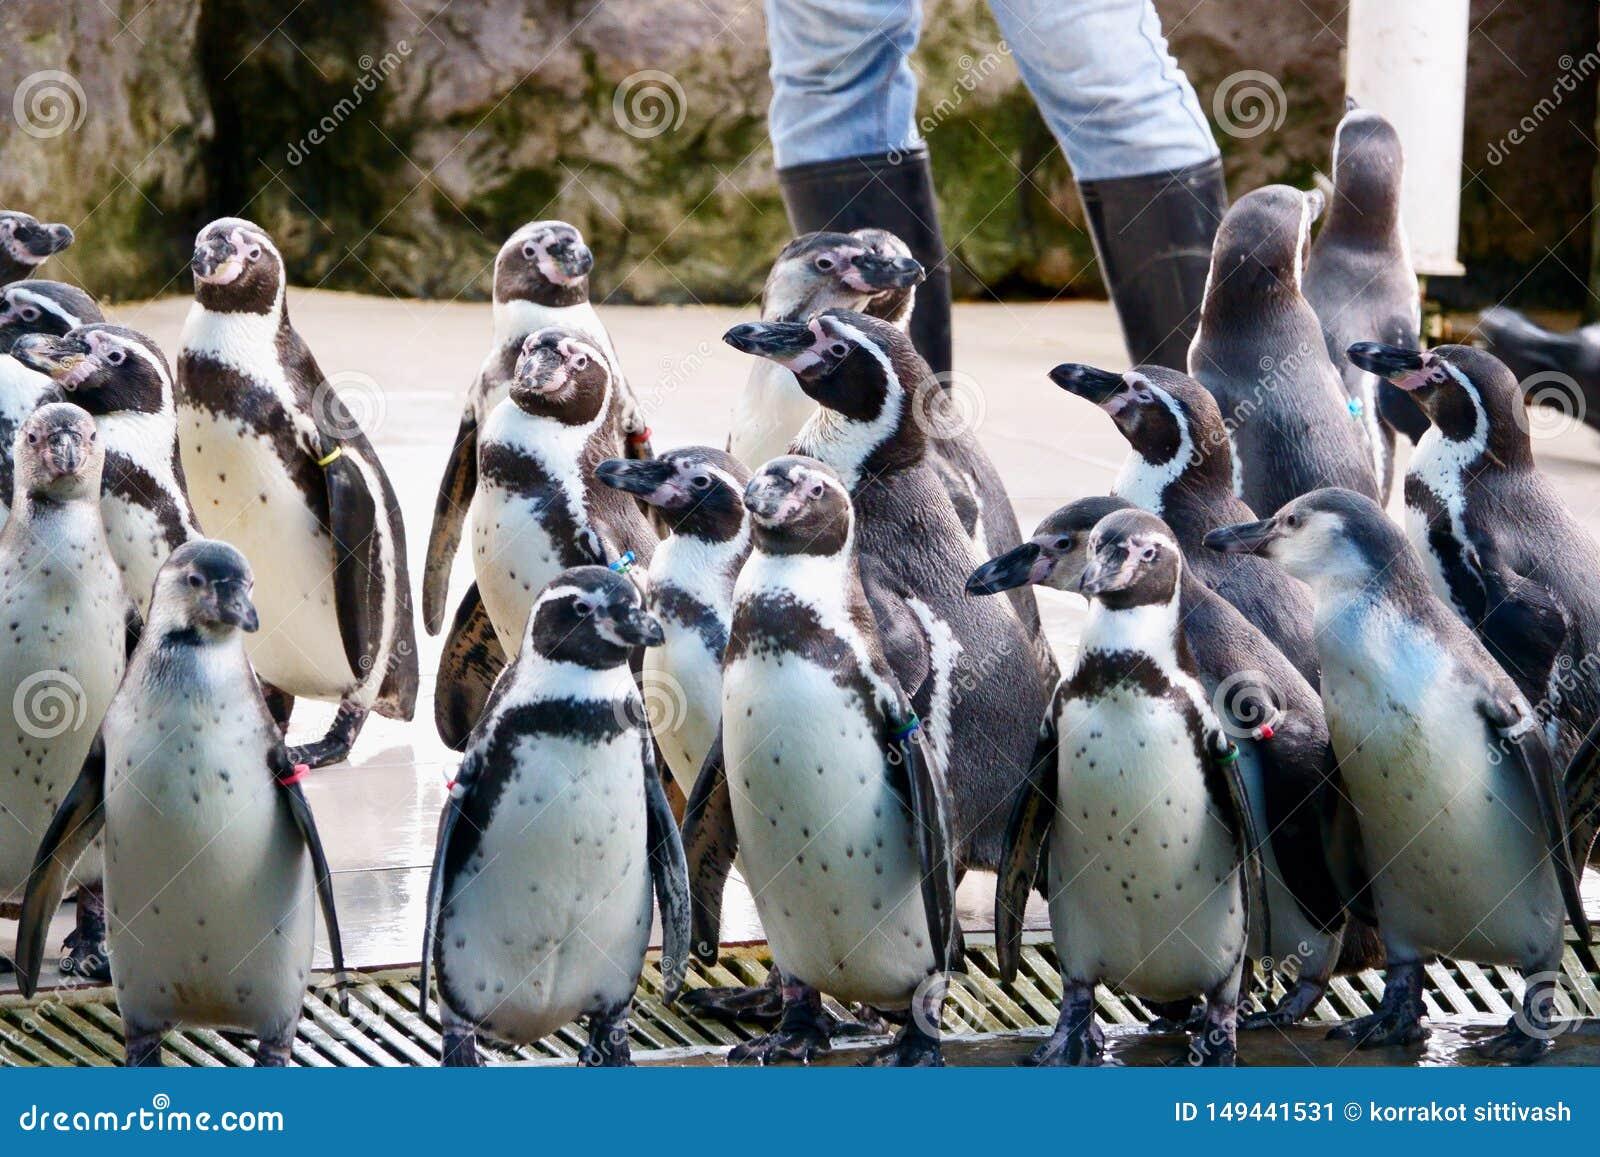 Pinguino allo zoo aperto di Khao Kheow, Pattaya Tailandia